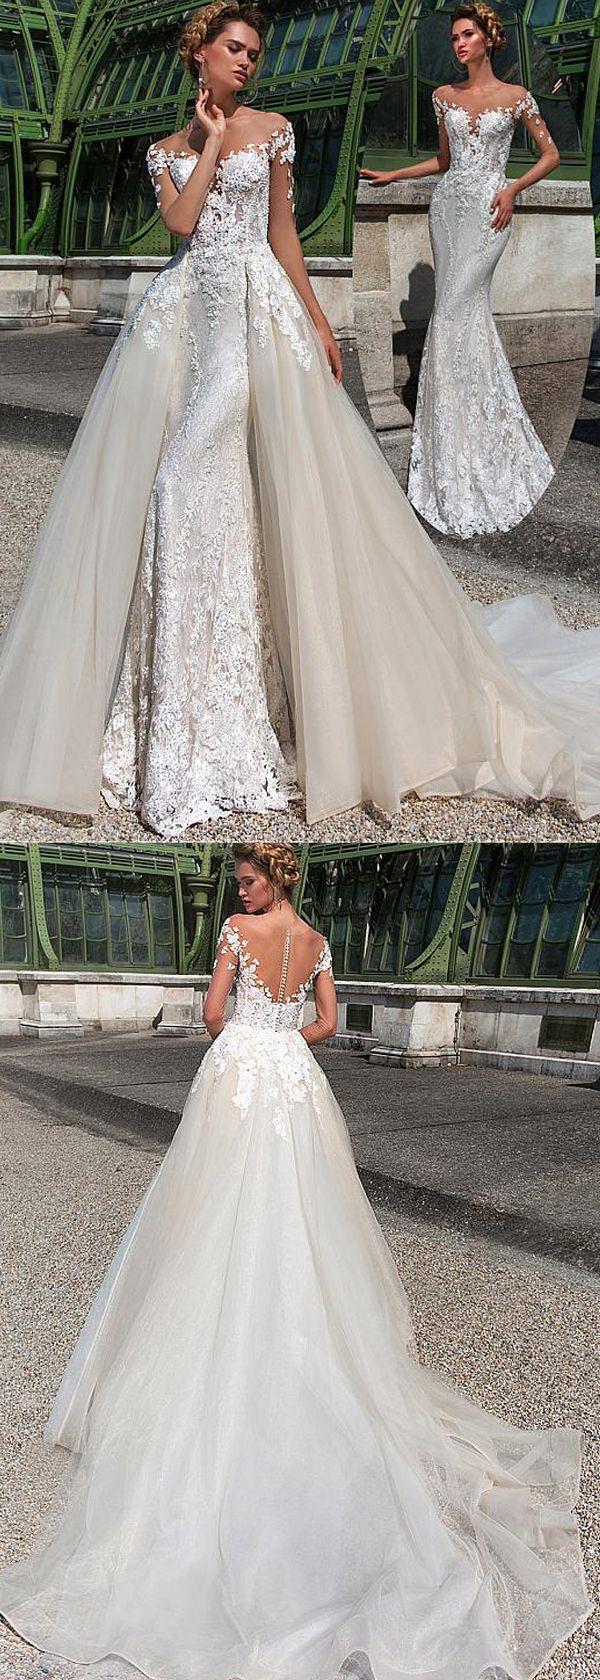 64 best 2 In 1 Wedding Dresses images on Pinterest | Lace applique ...